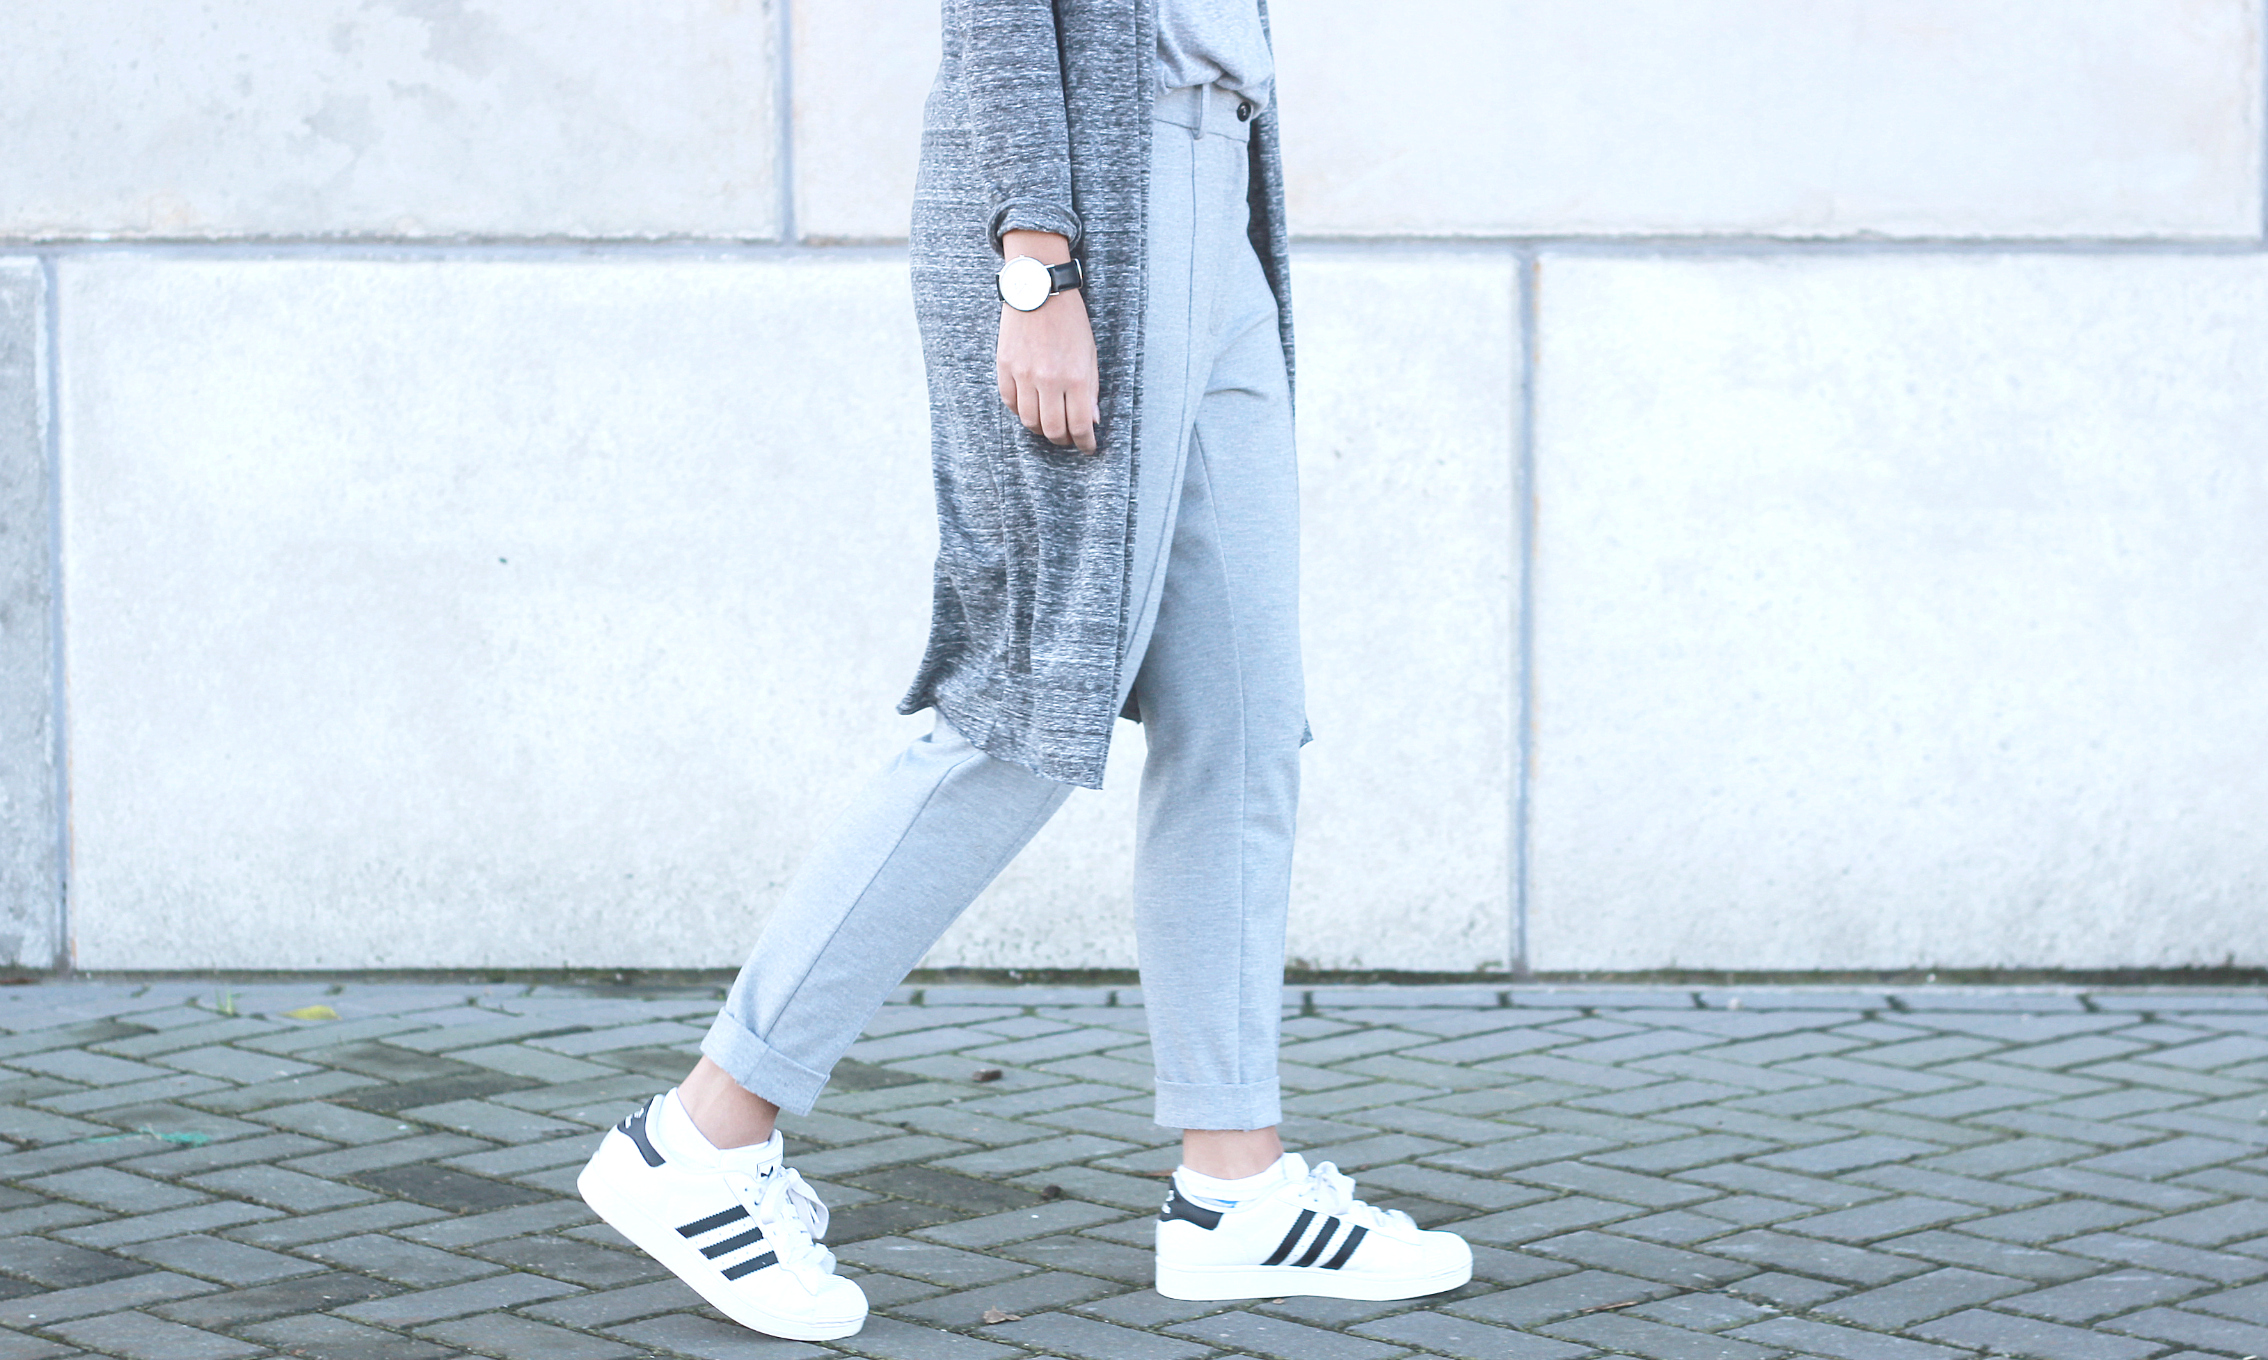 Adidas-superstar-street-style-trend